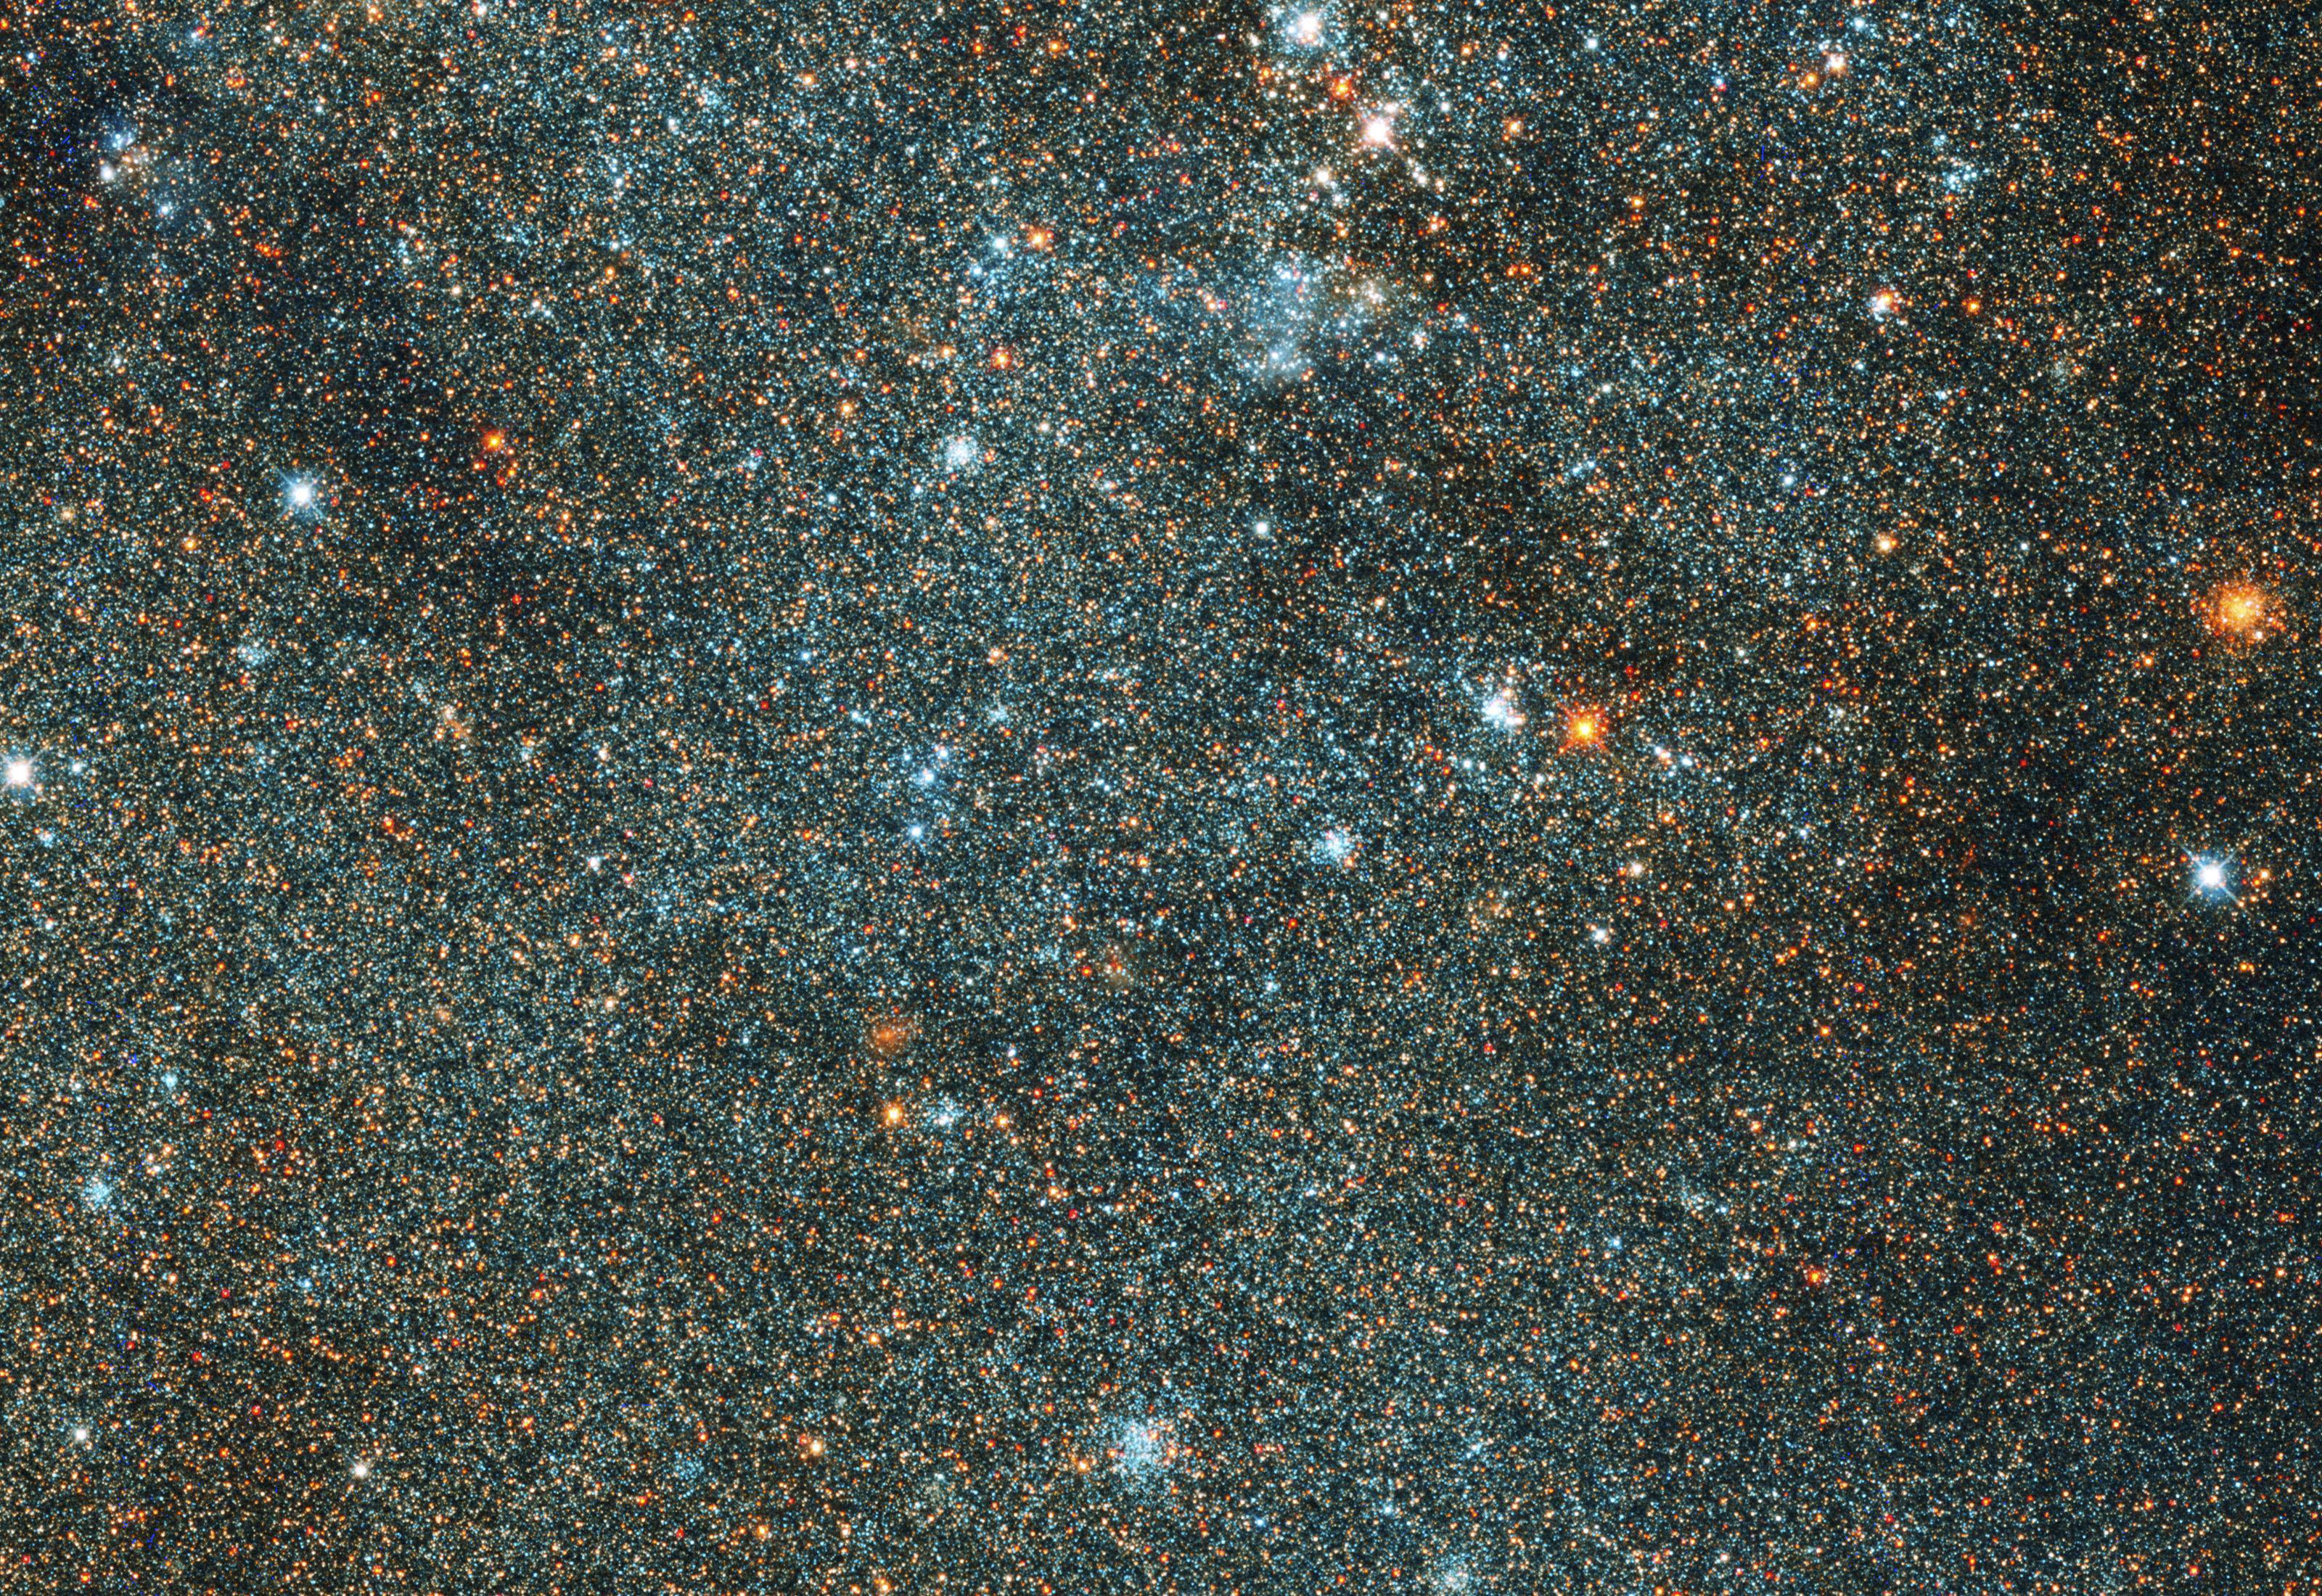 ultra high resolution andromeda galaxy - photo #43